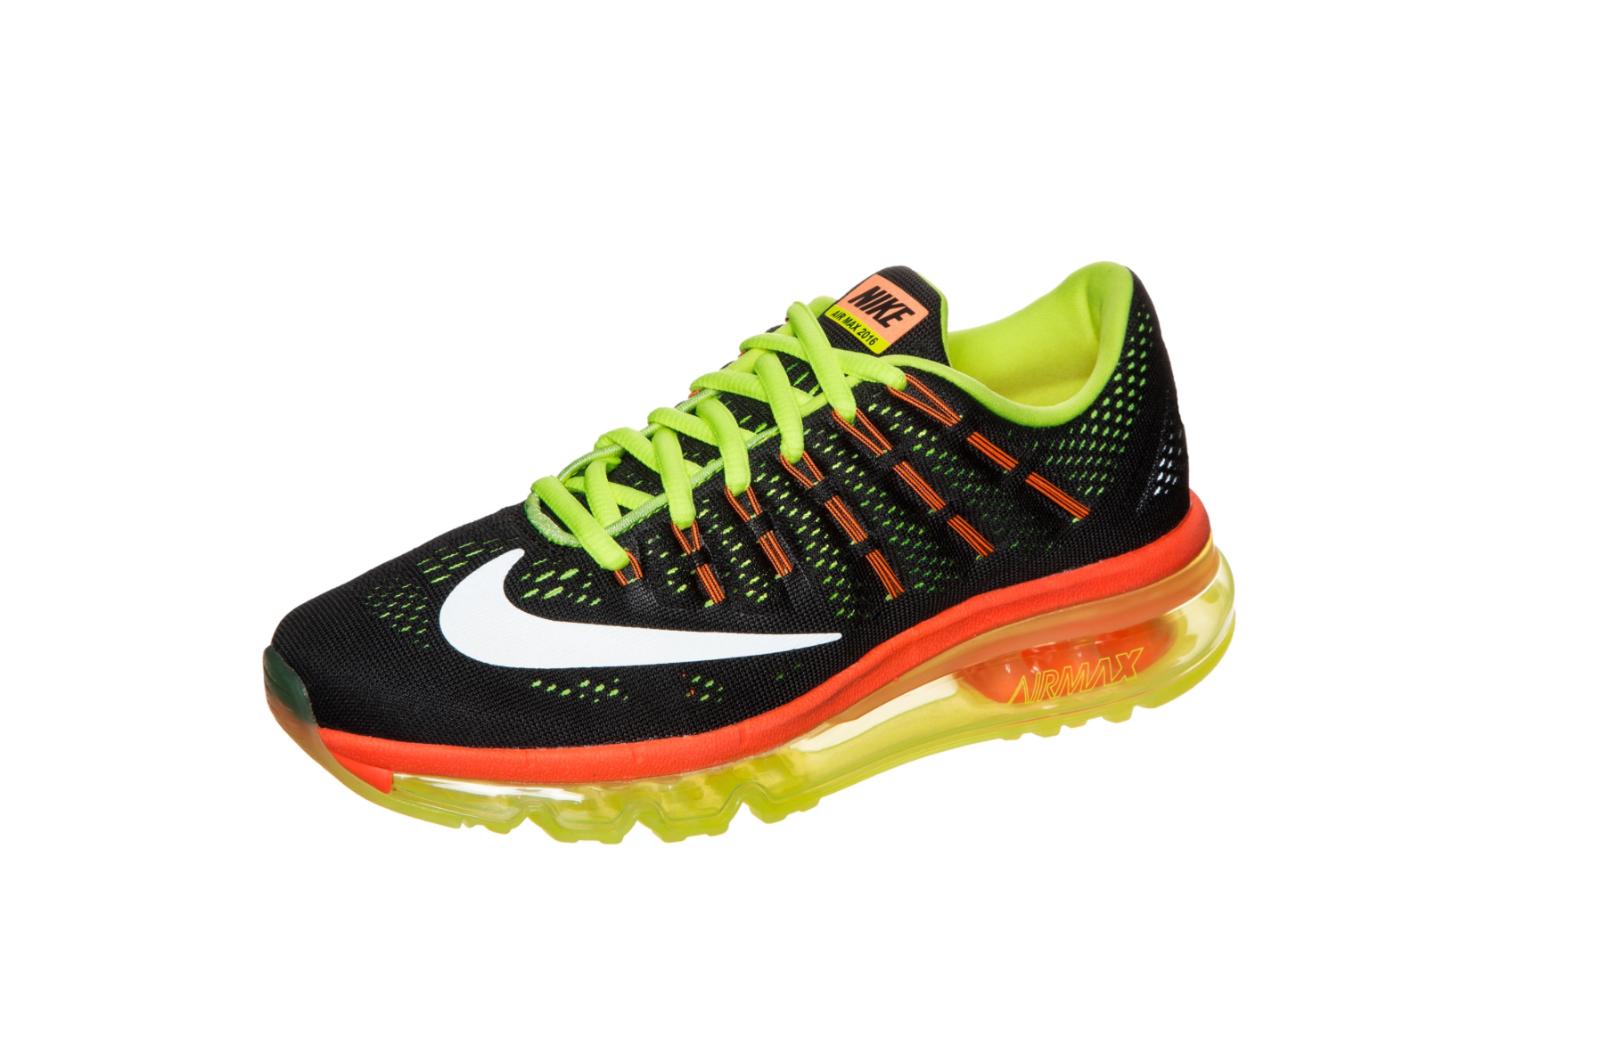 quality design 0f6aa 0a060 Nike Air Max 2016 Sneakers Boys  Grade School 807236-002